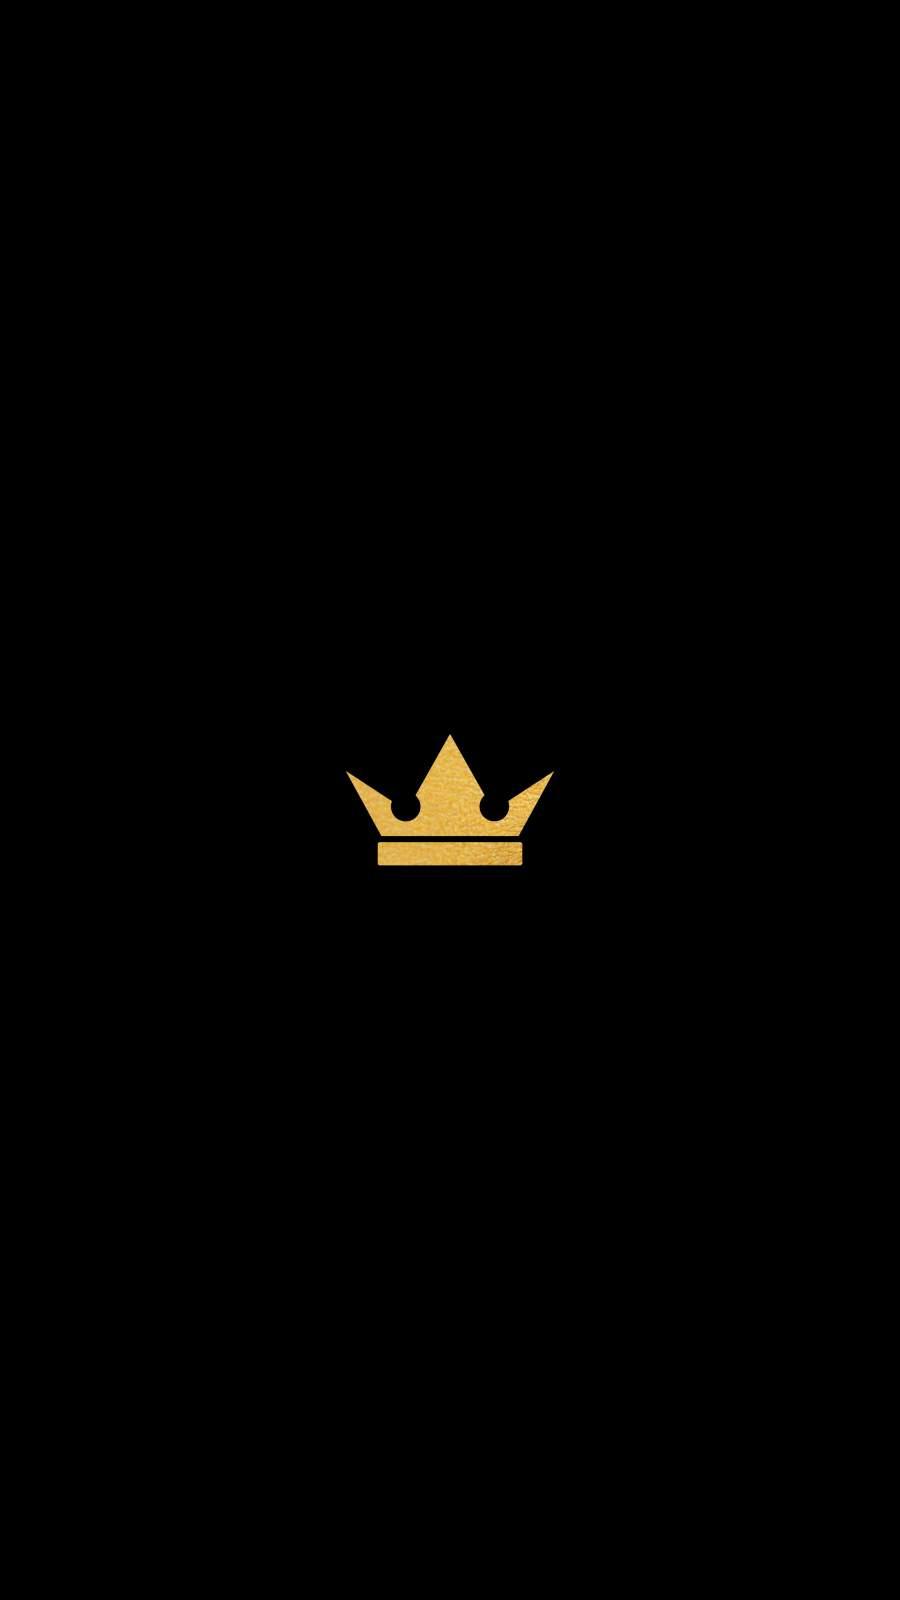 King Crown iPhone Wallpaper